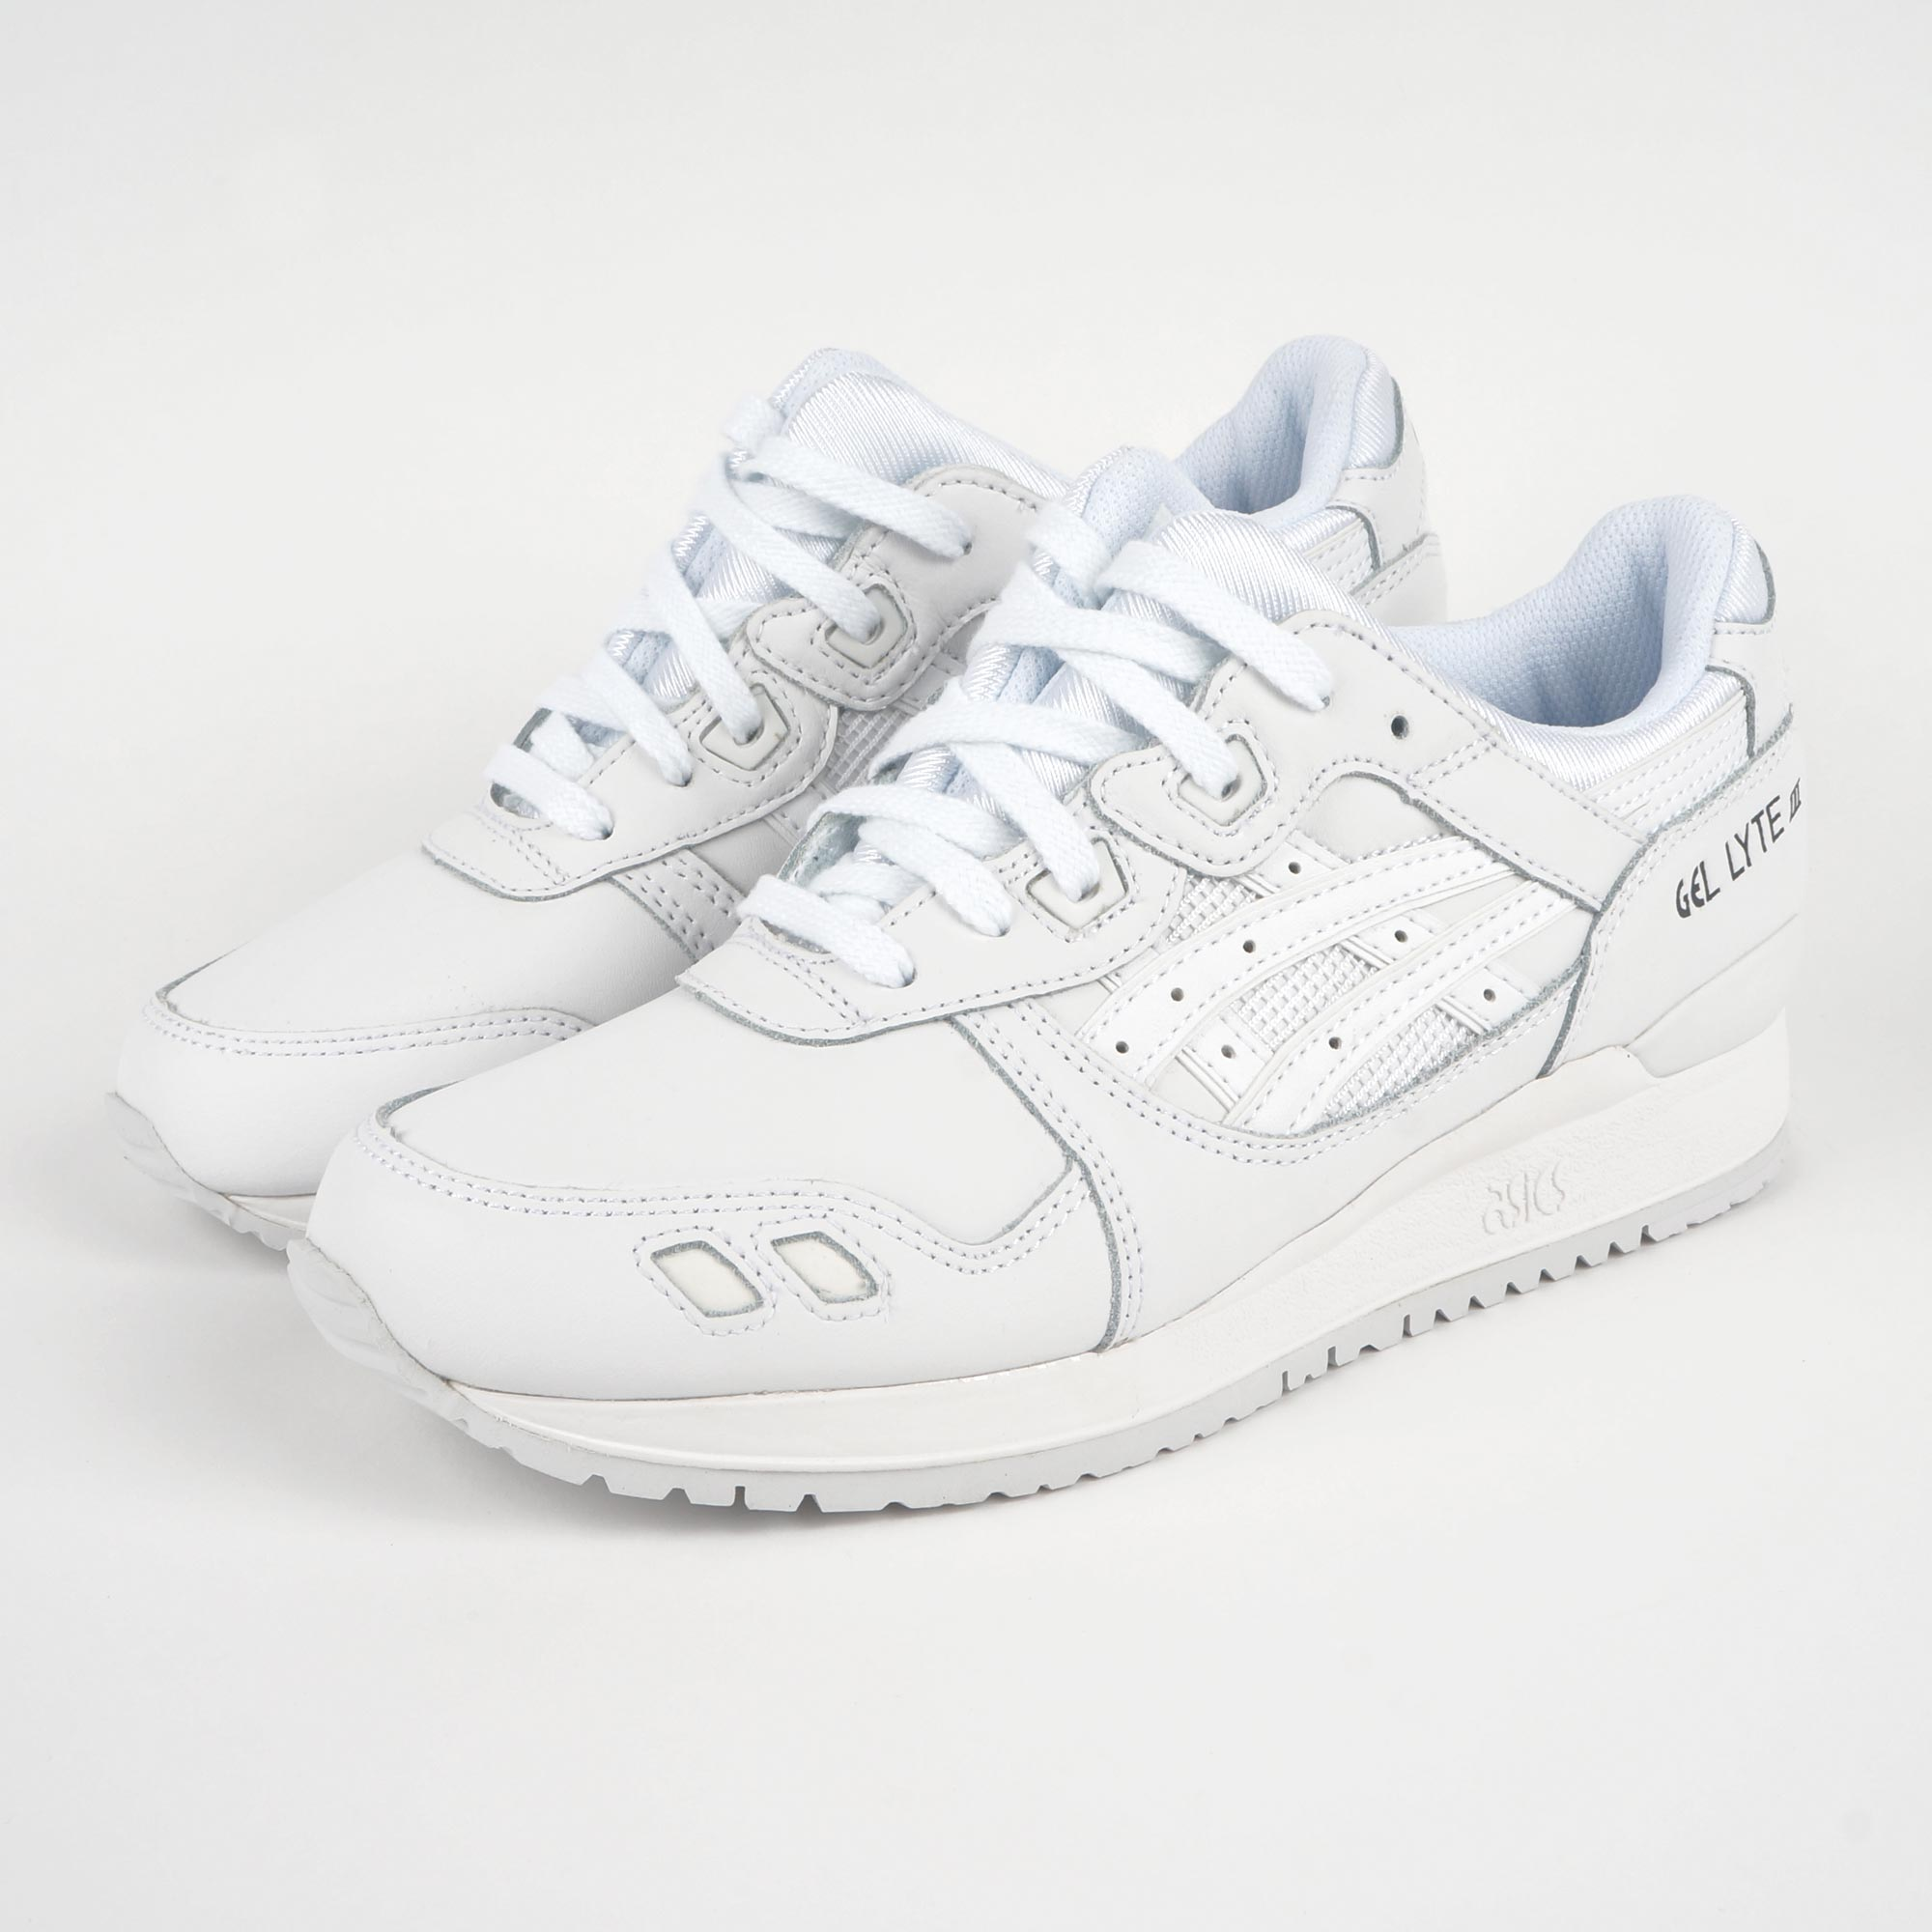 asics blanche femme Shop Clothing & Shoes Online